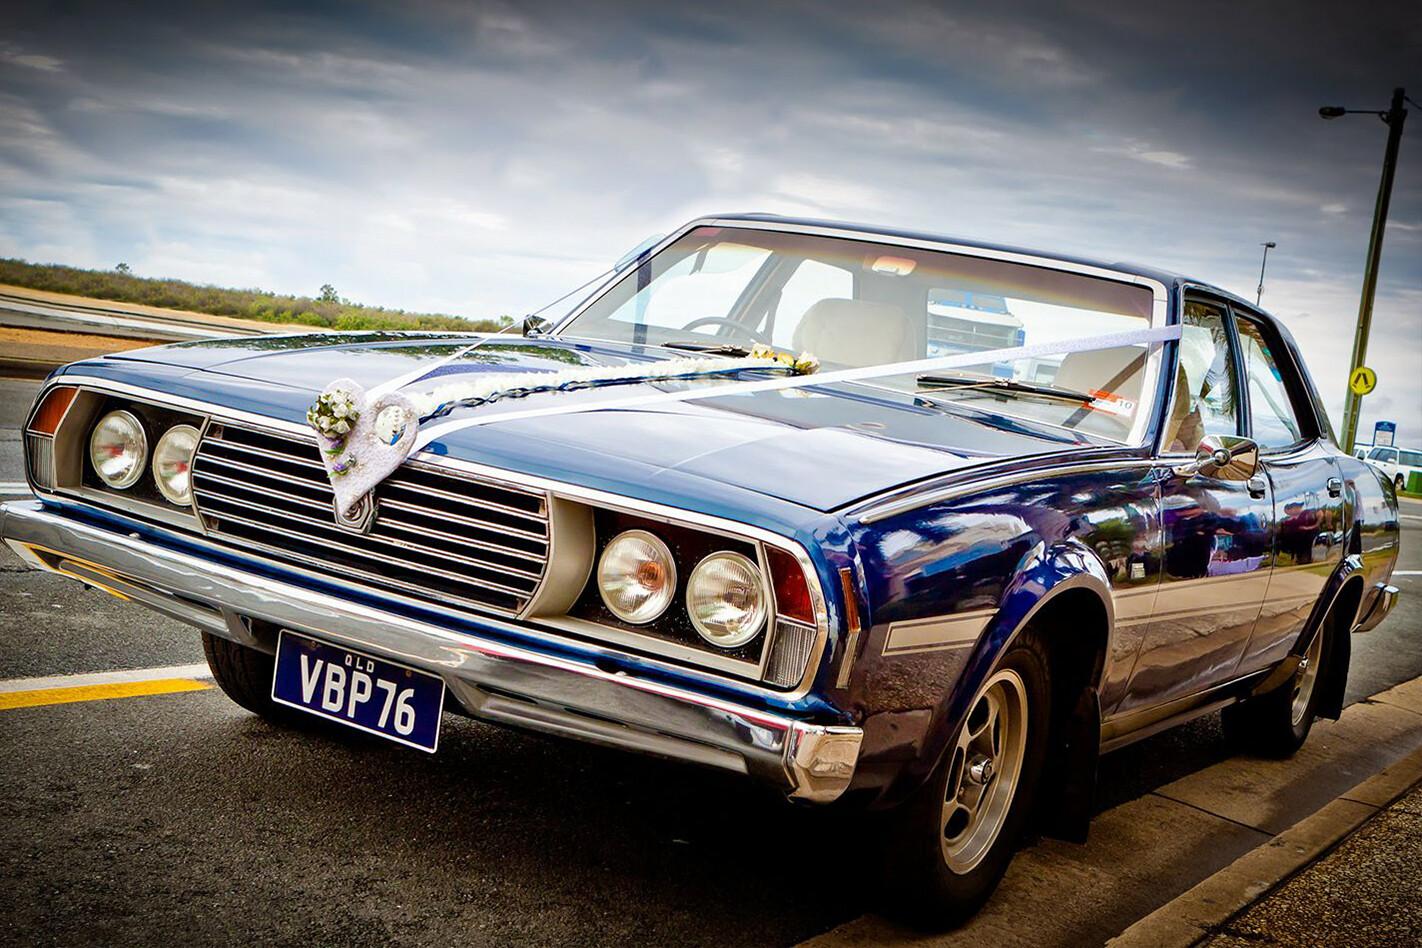 Andrew Smith's Leyland wedding car